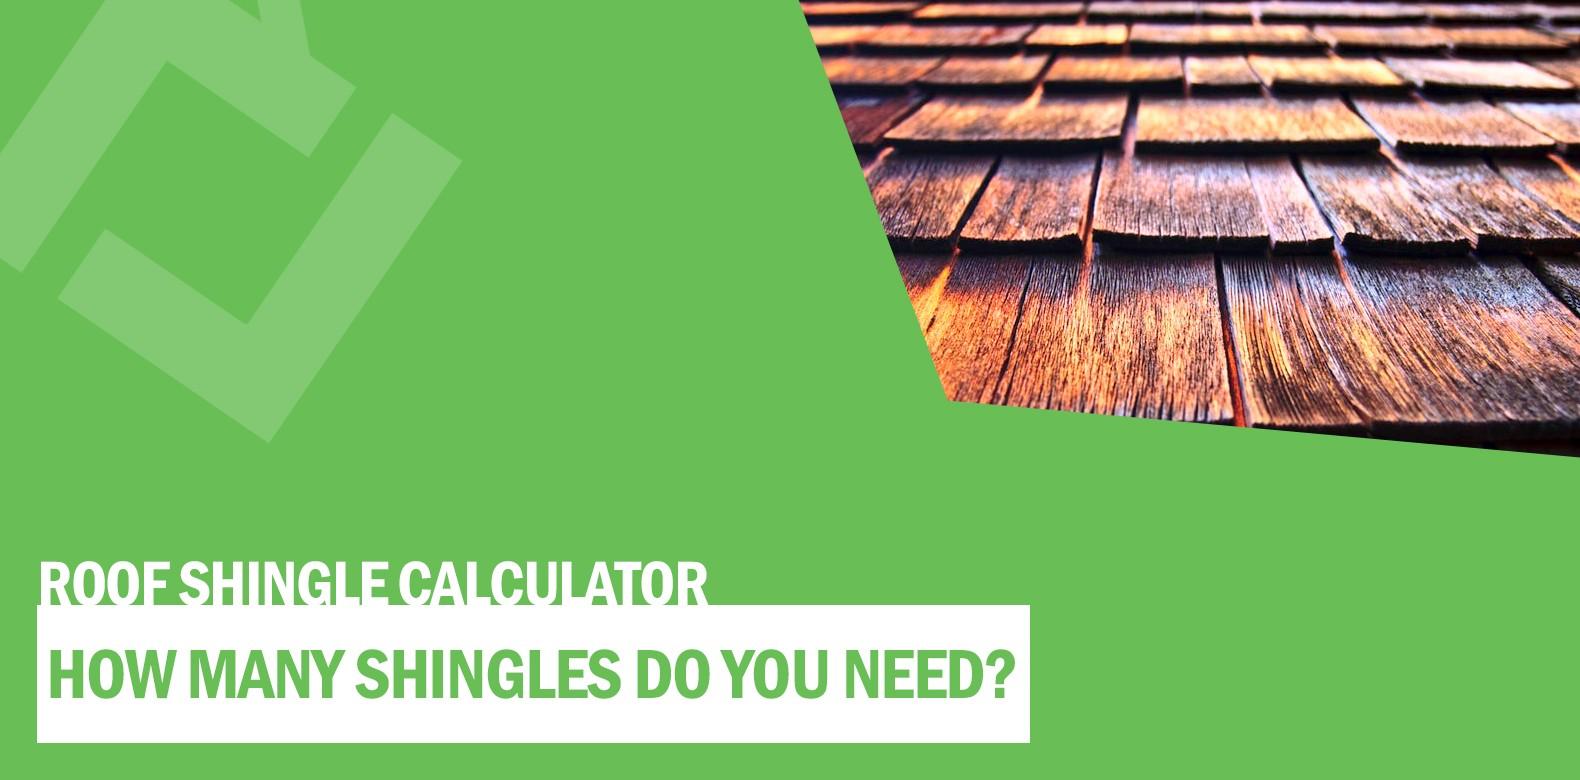 How Many Roof Shingles Do You Need?